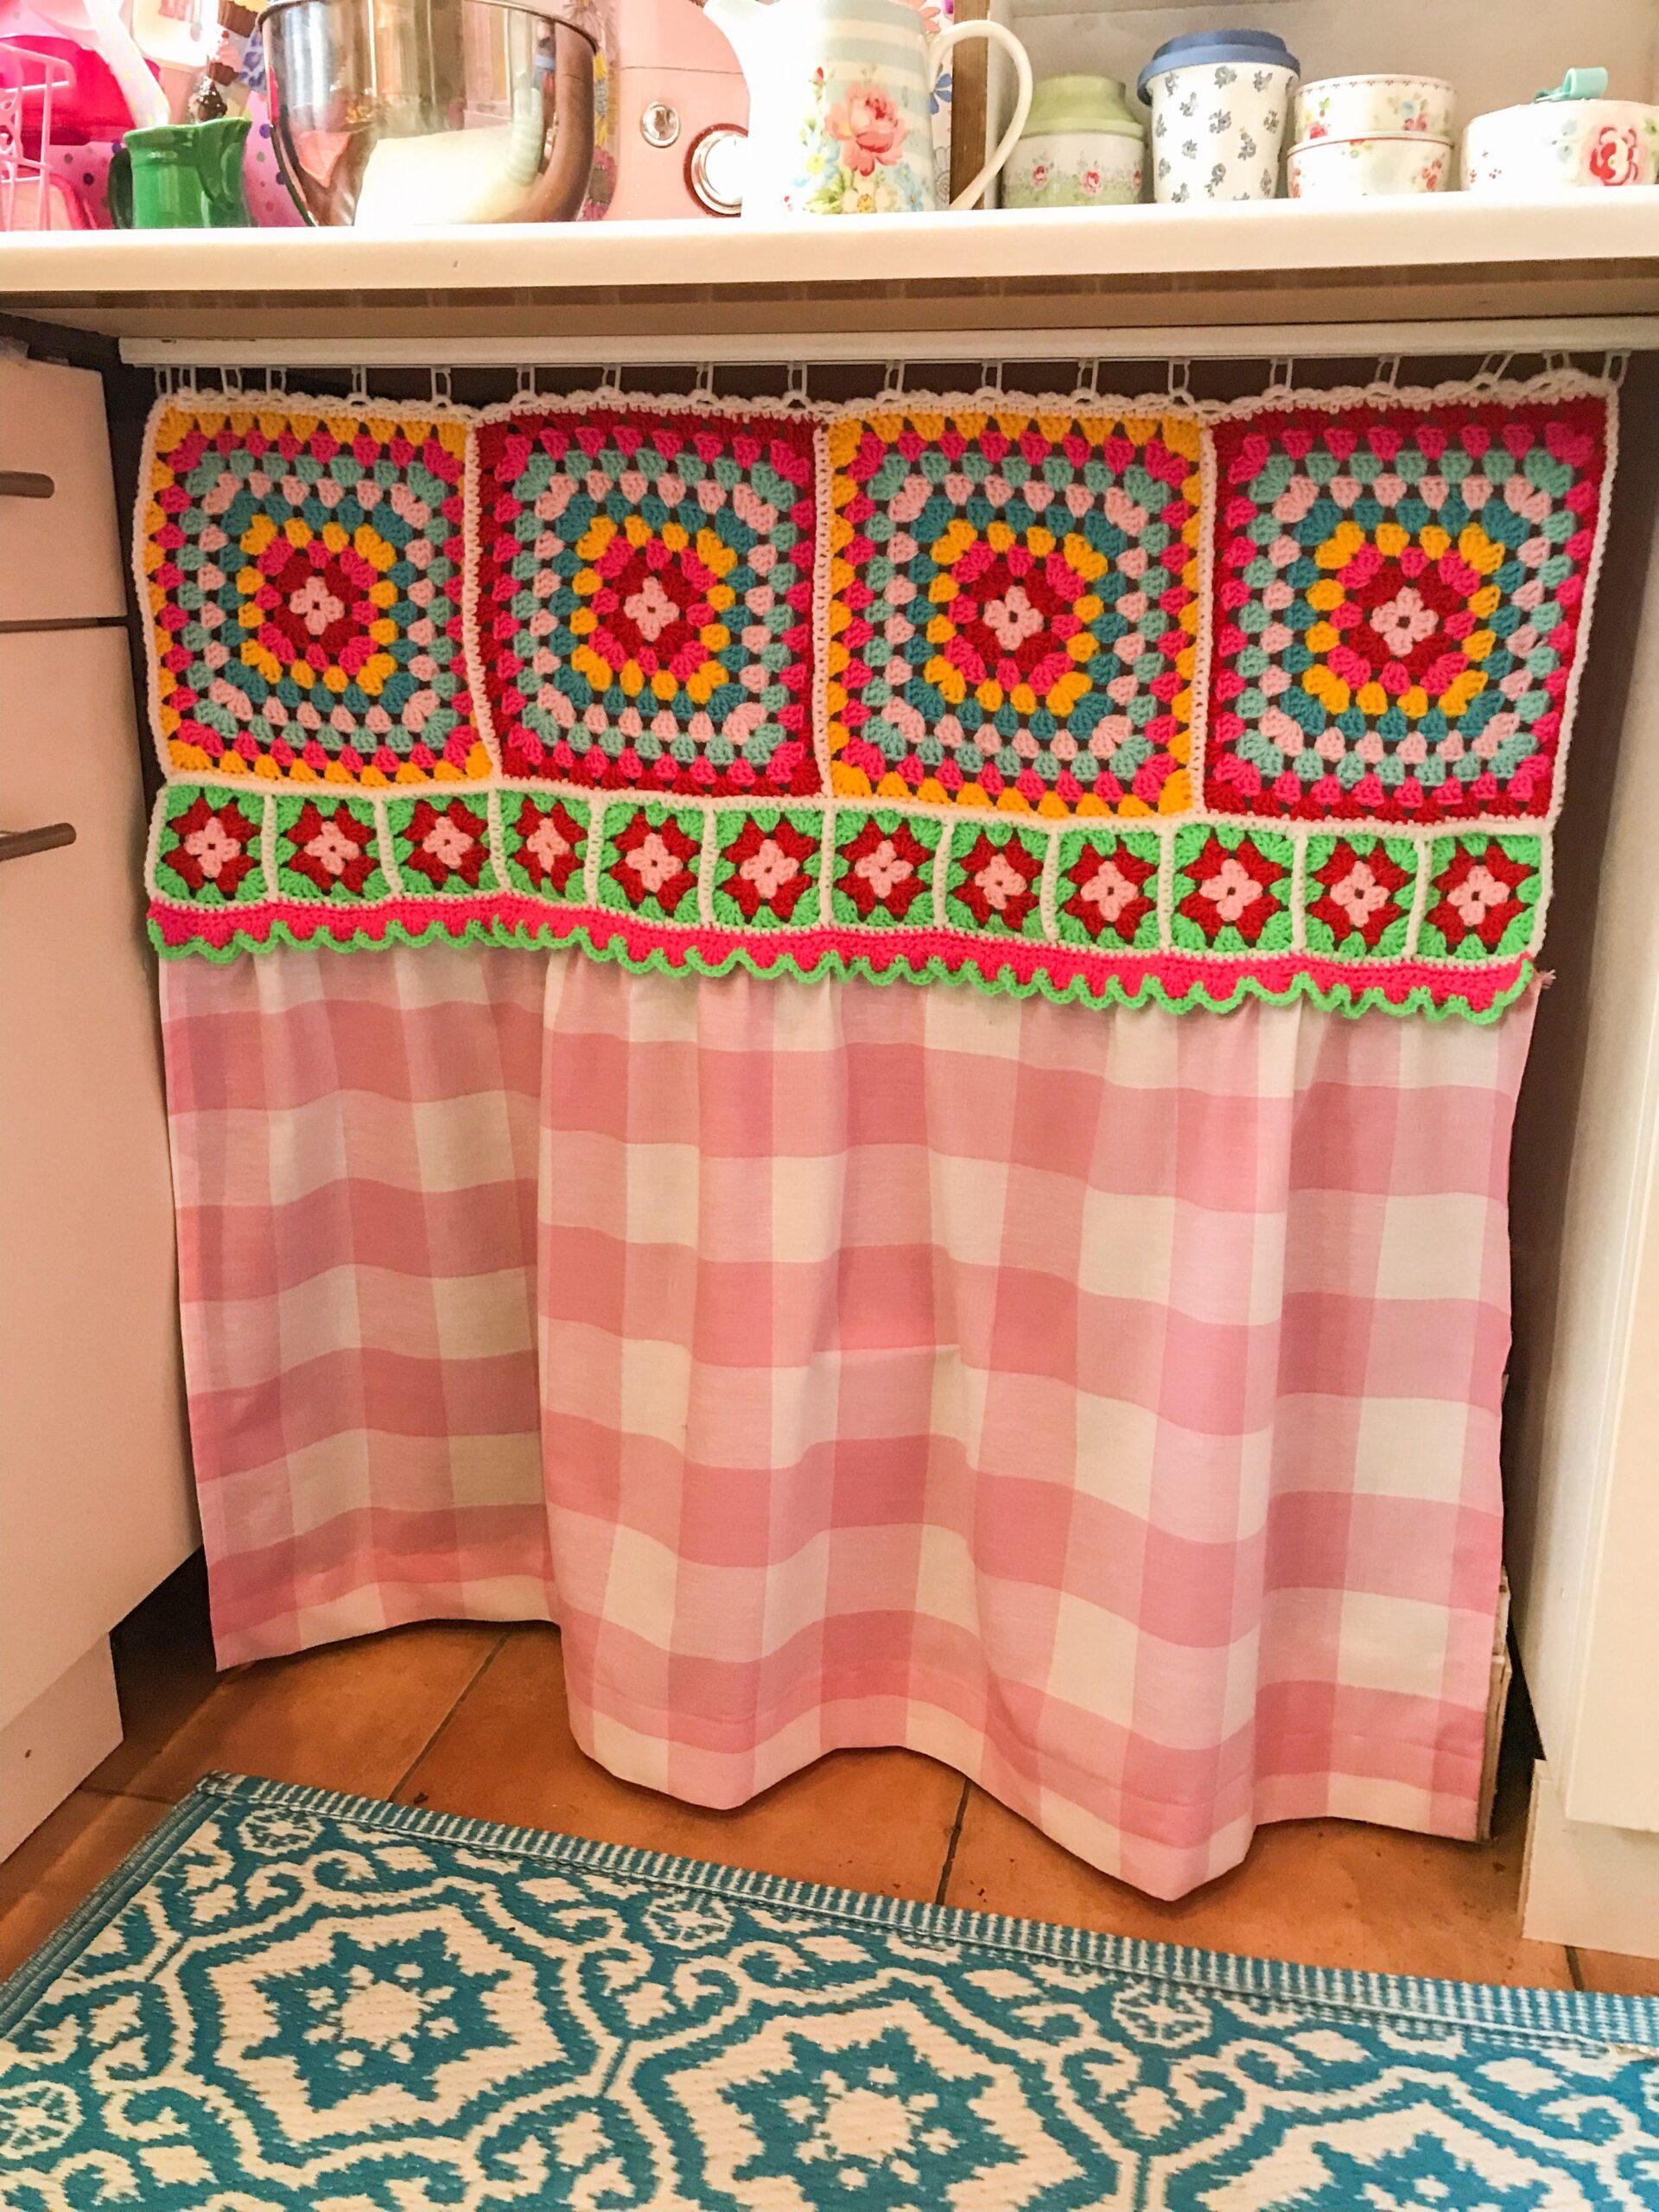 Full Size of Küchenvorhang Mein Kchenvorhang Genht Mit Gehkelt Granny Square Bunt Vintage Wohnzimmer Küchenvorhang